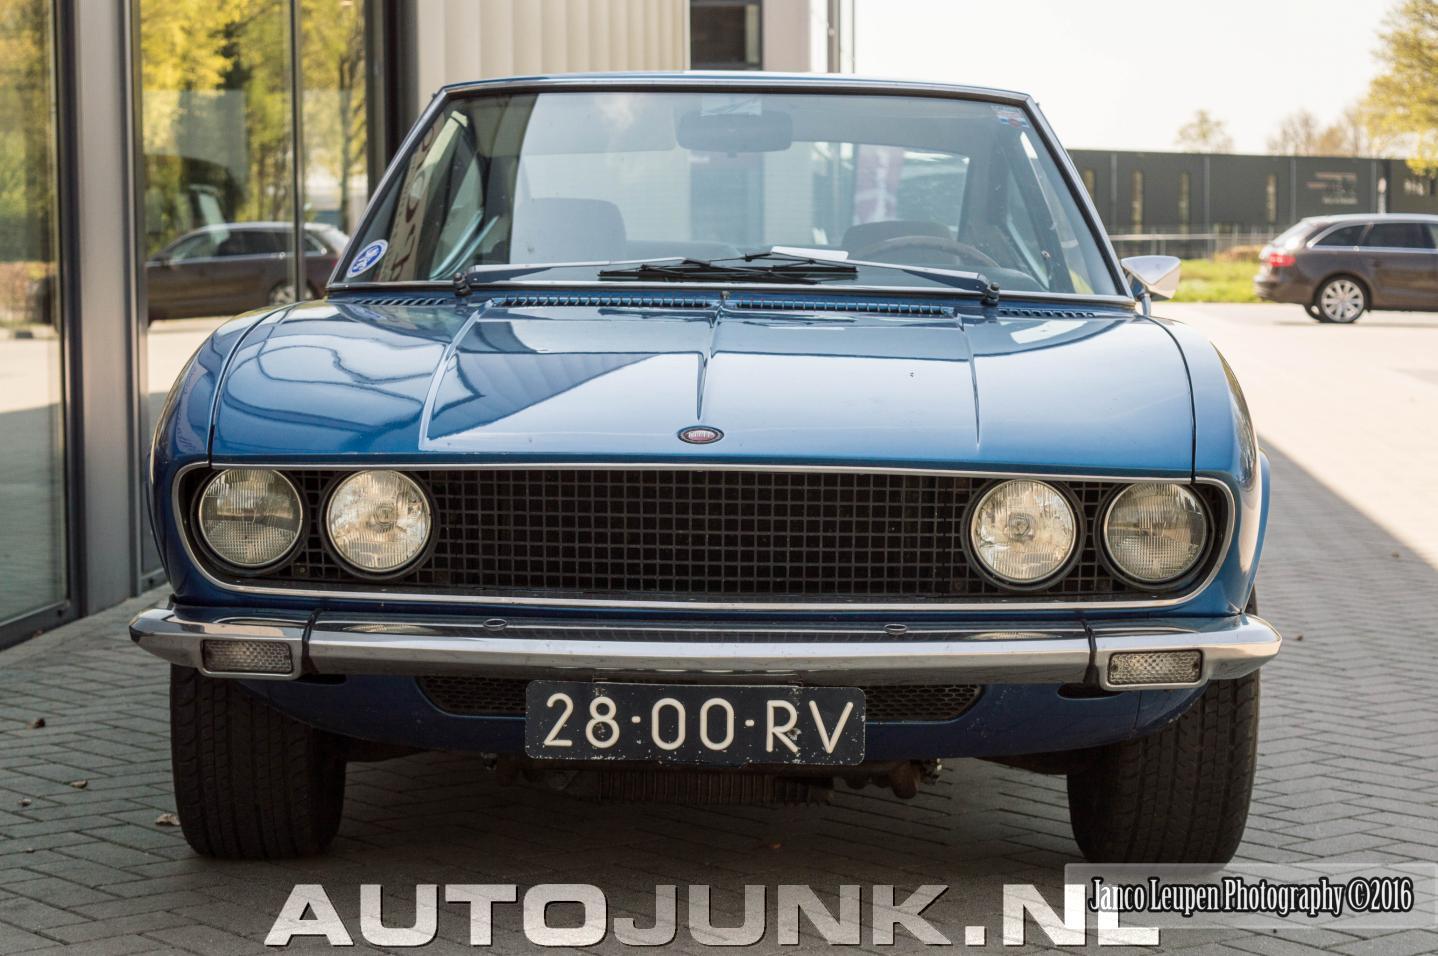 Fiat Dino 2400 Coupe foto's » Autojunk.nl (167887)